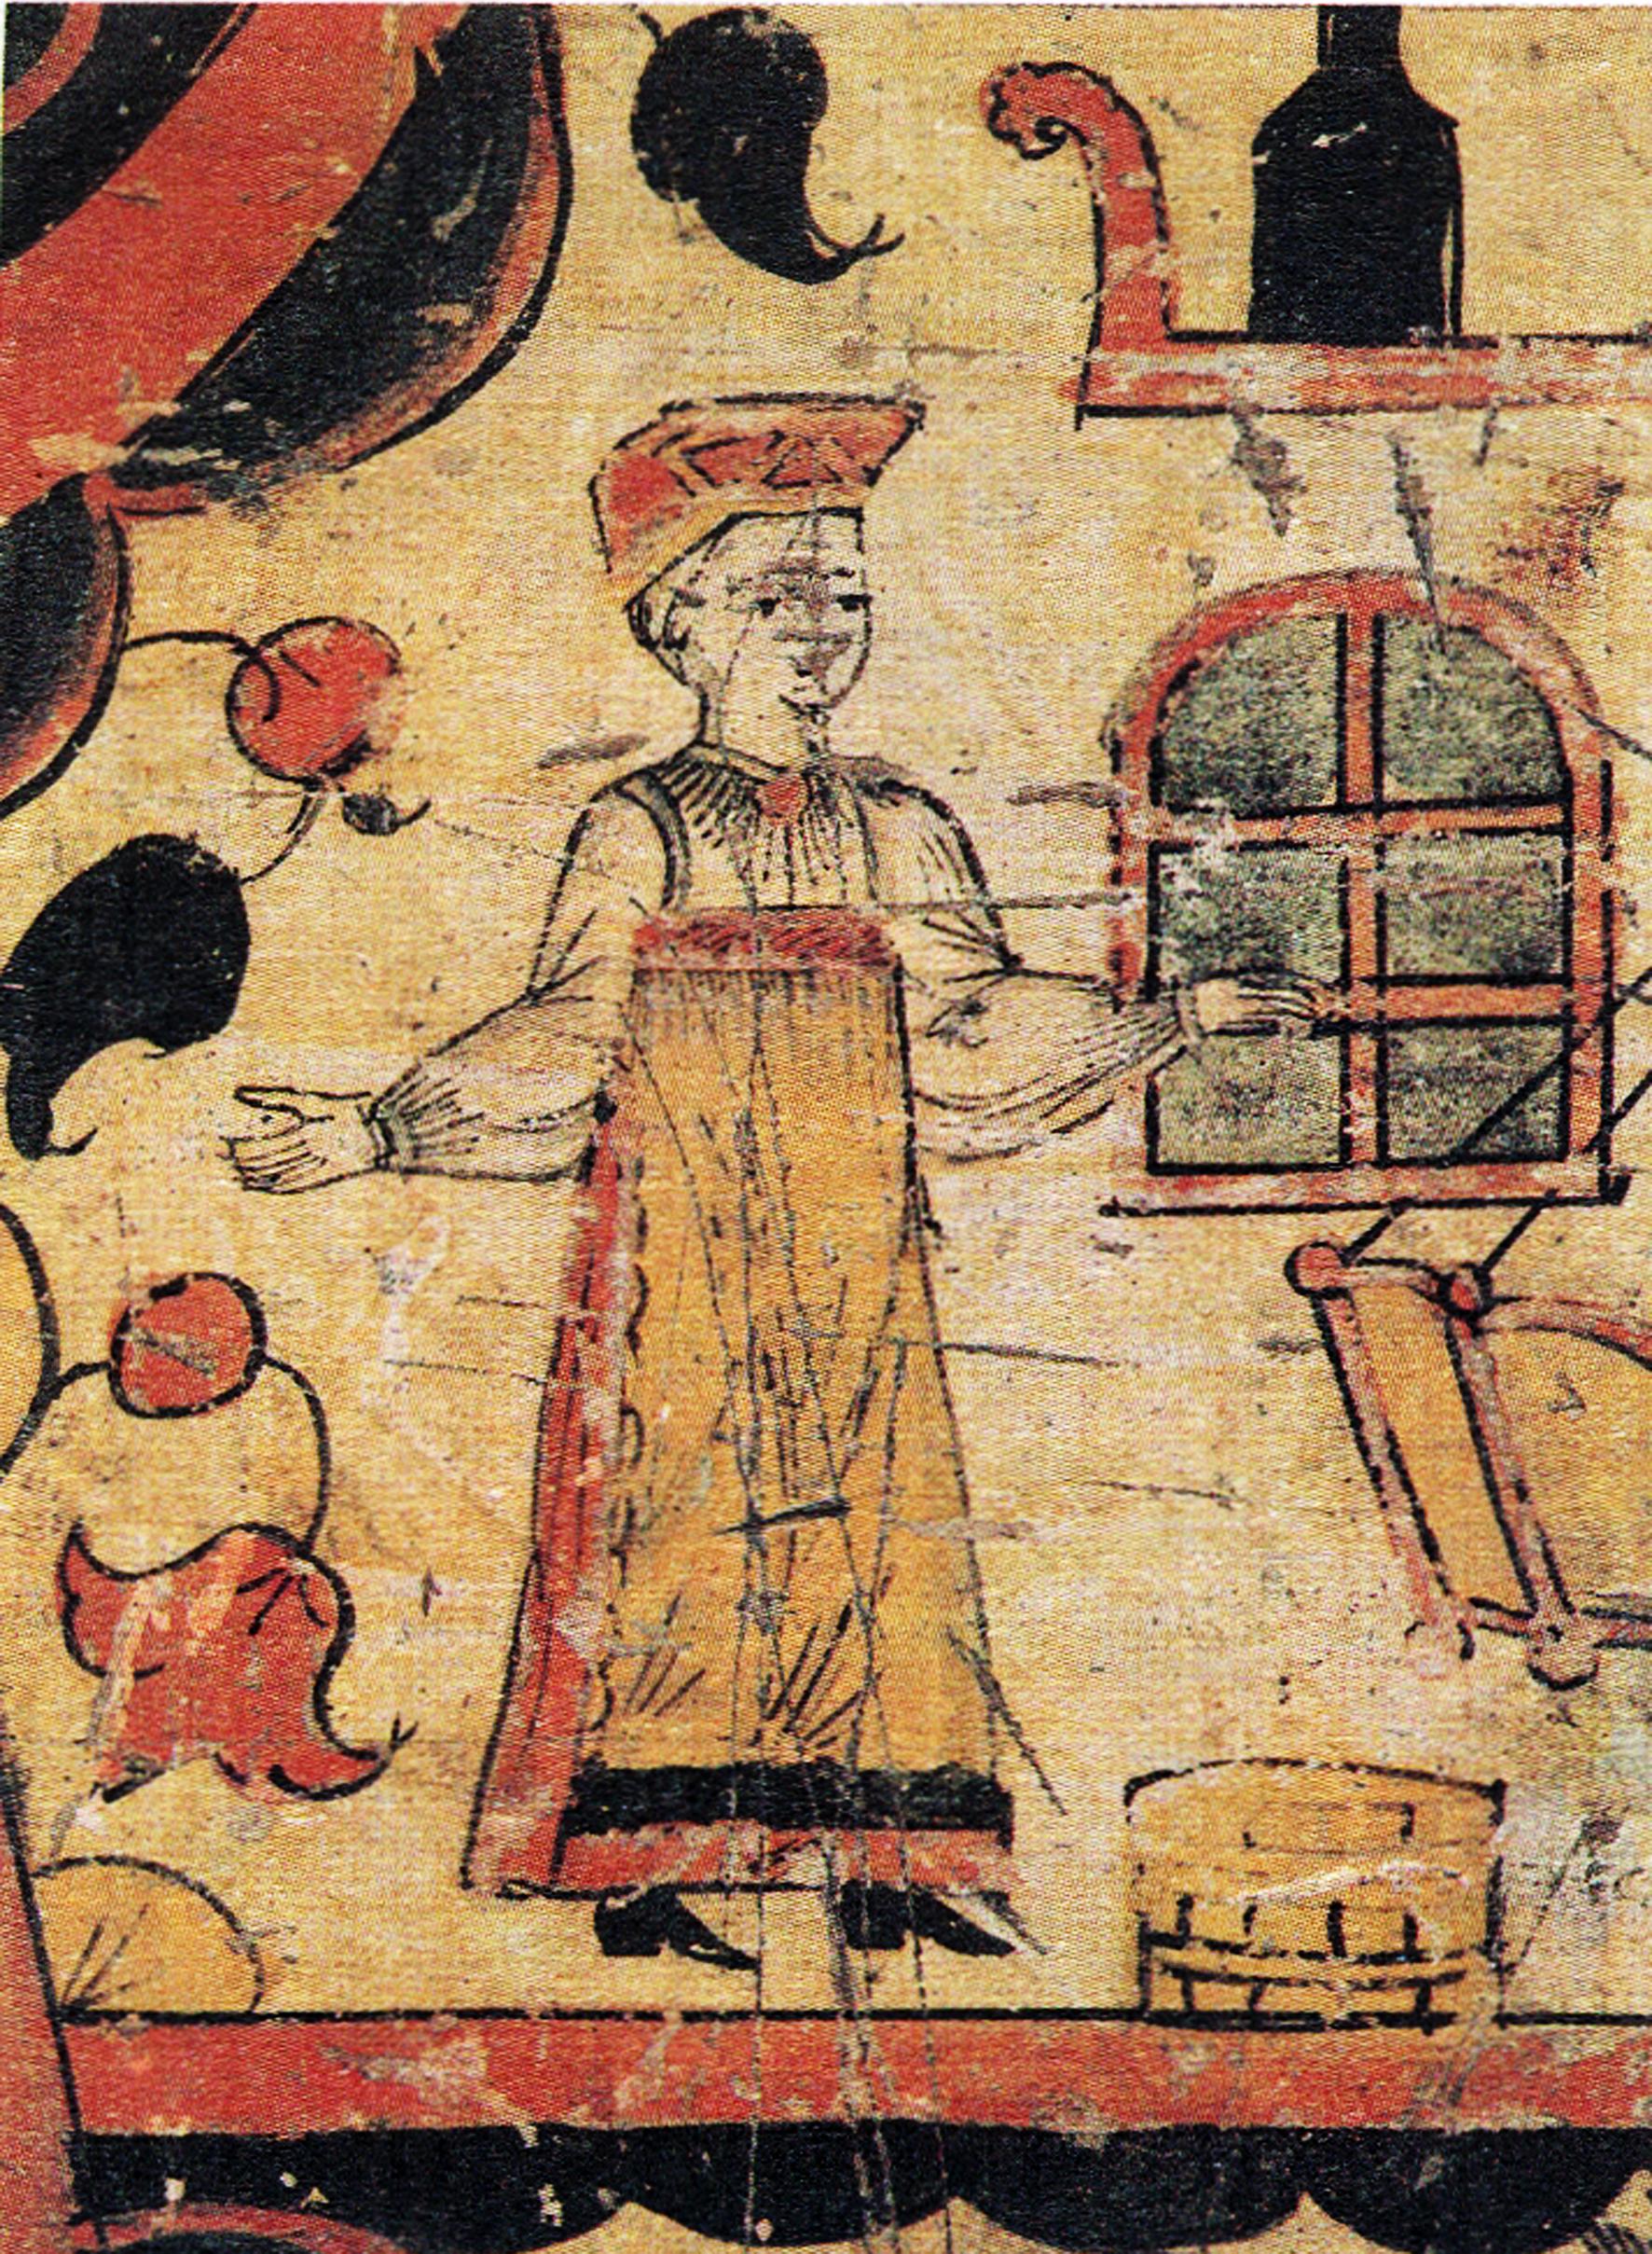 http://www.booksite.ru/trade_vologda/picture/4_25.jpg